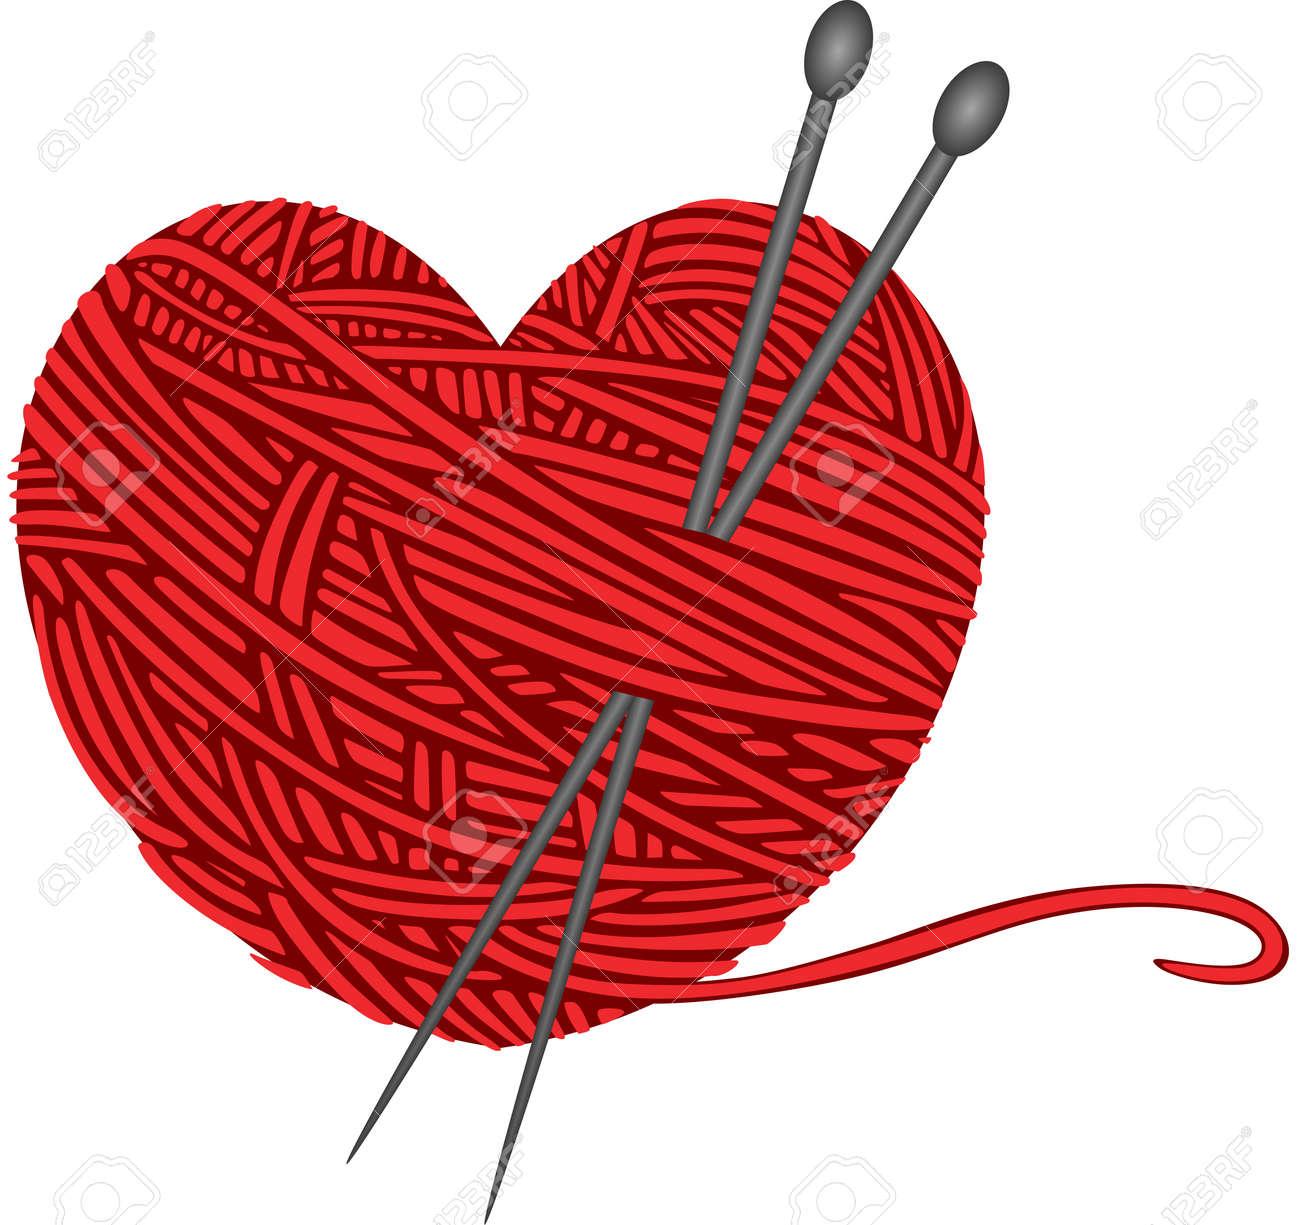 wool knitting heart shape royalty free cliparts vectors and stock rh 123rf com